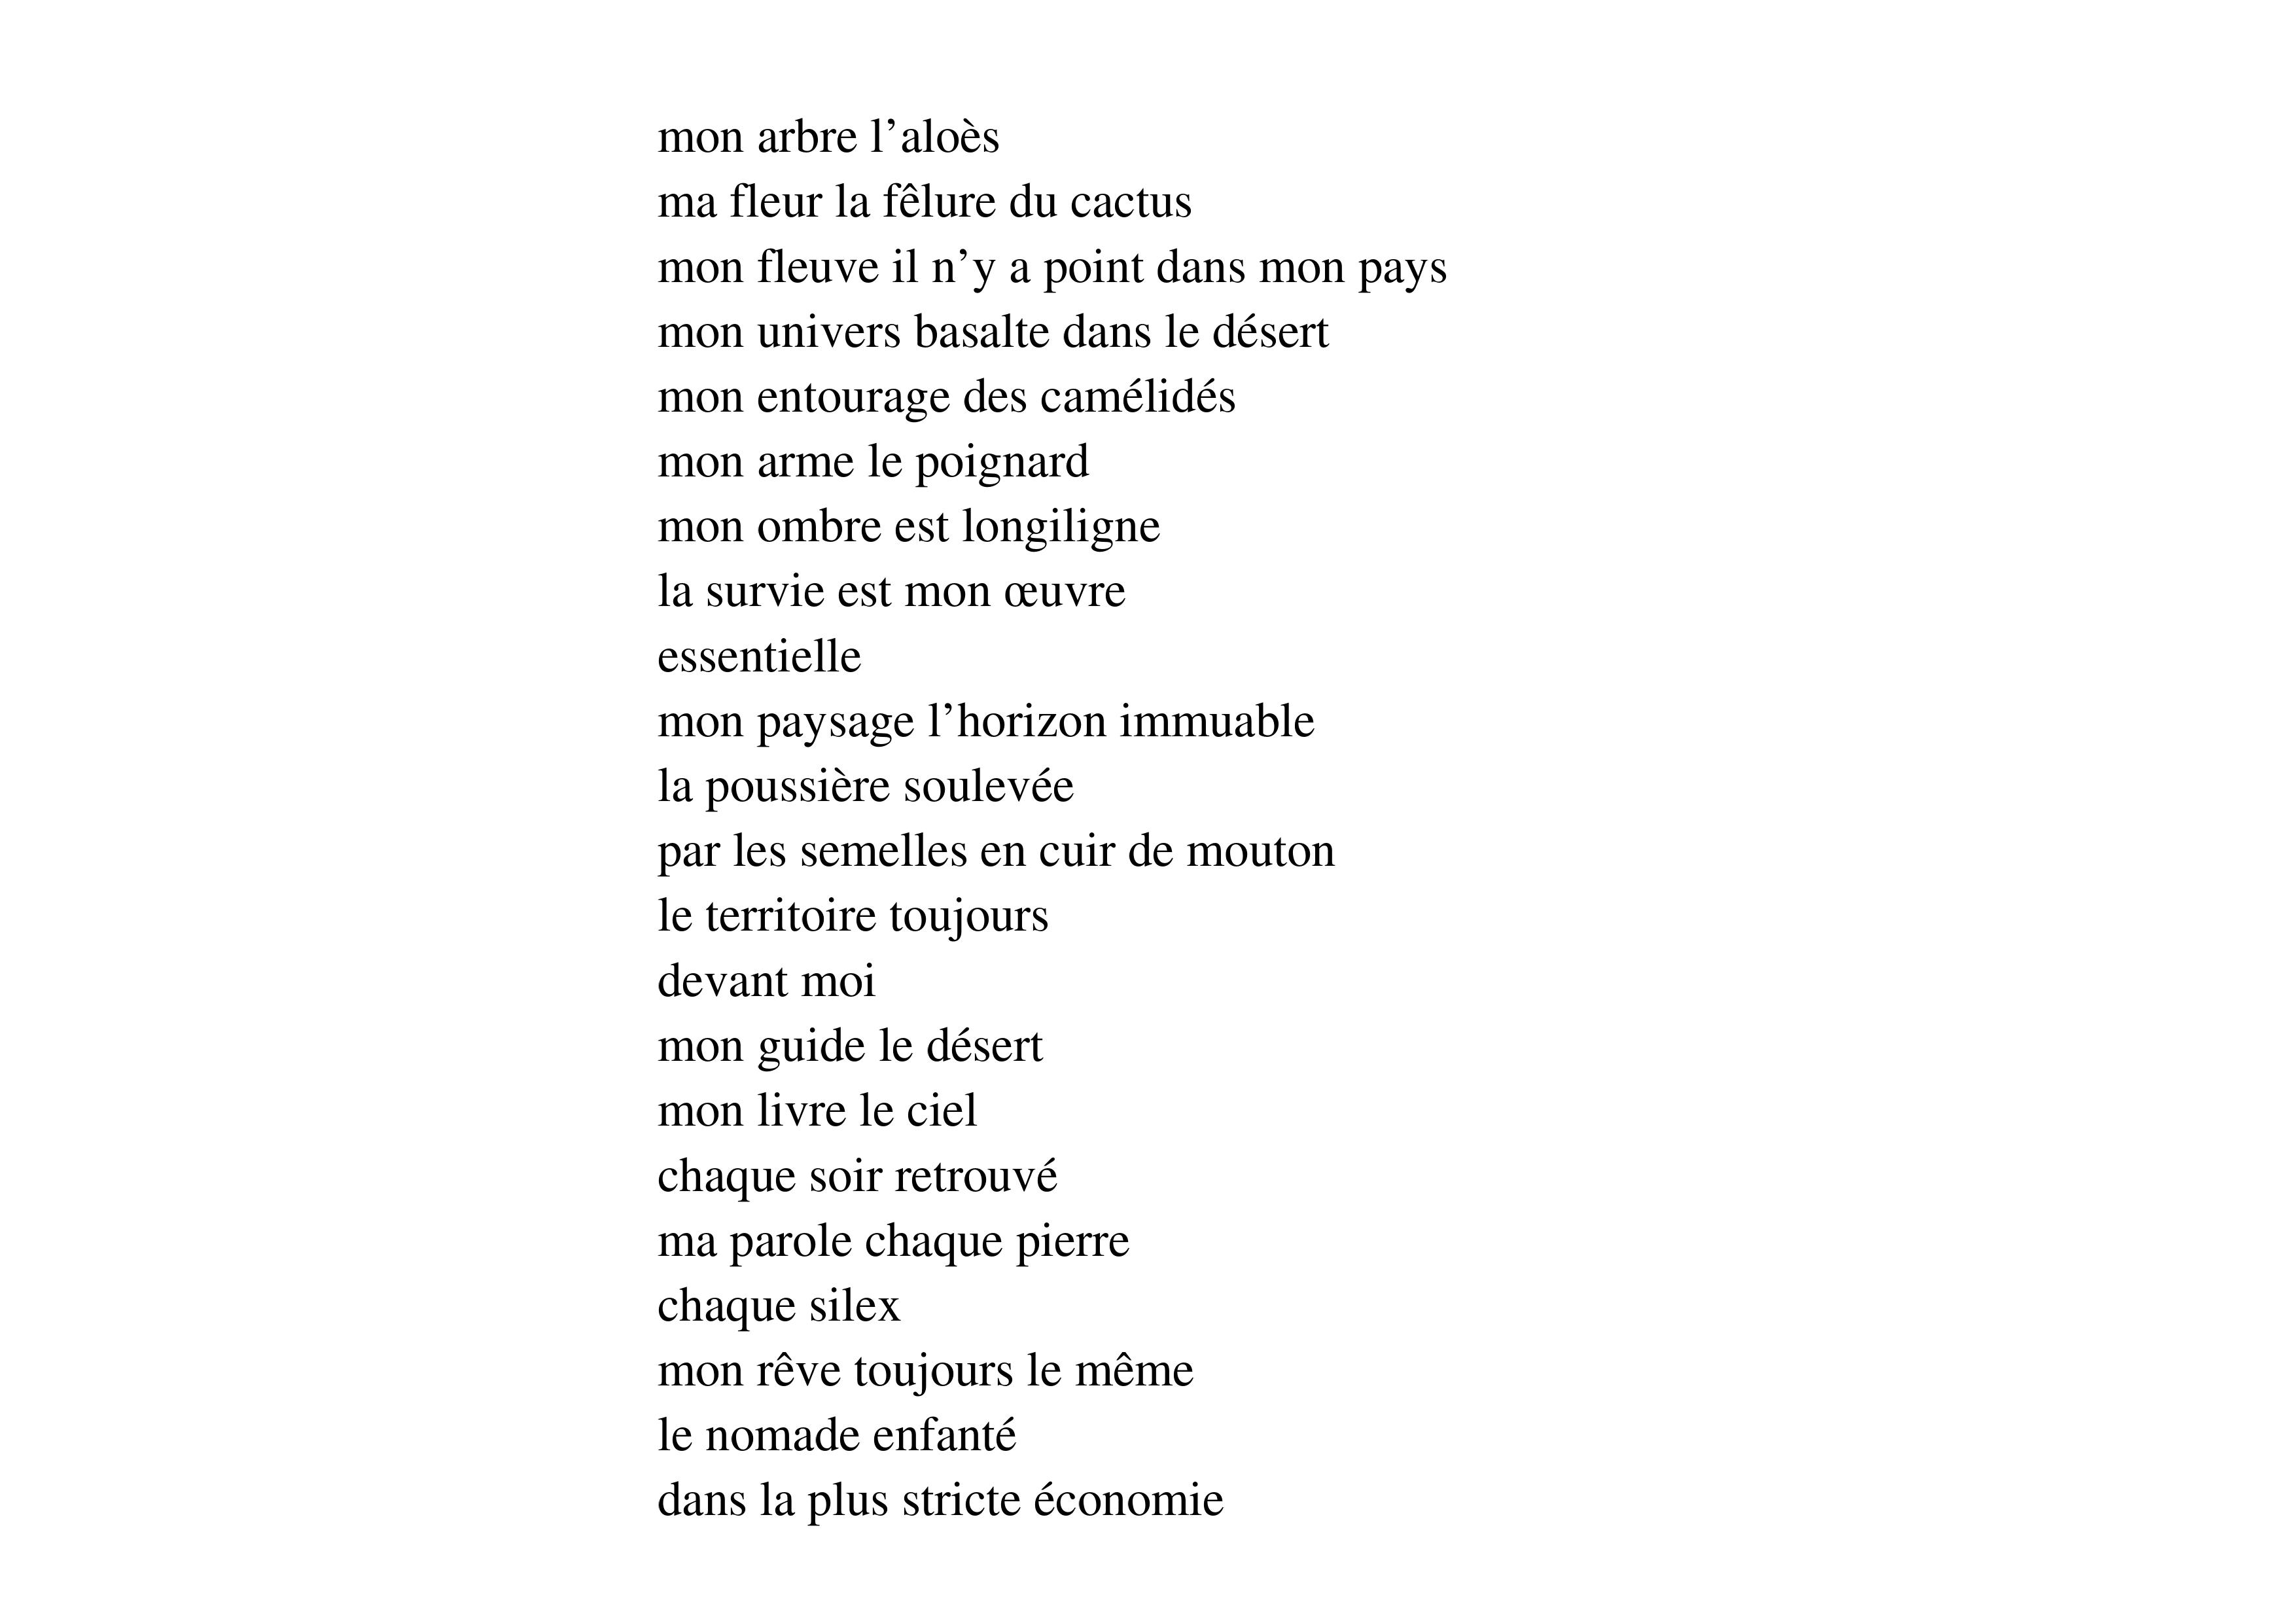 poesie y a t il un pays